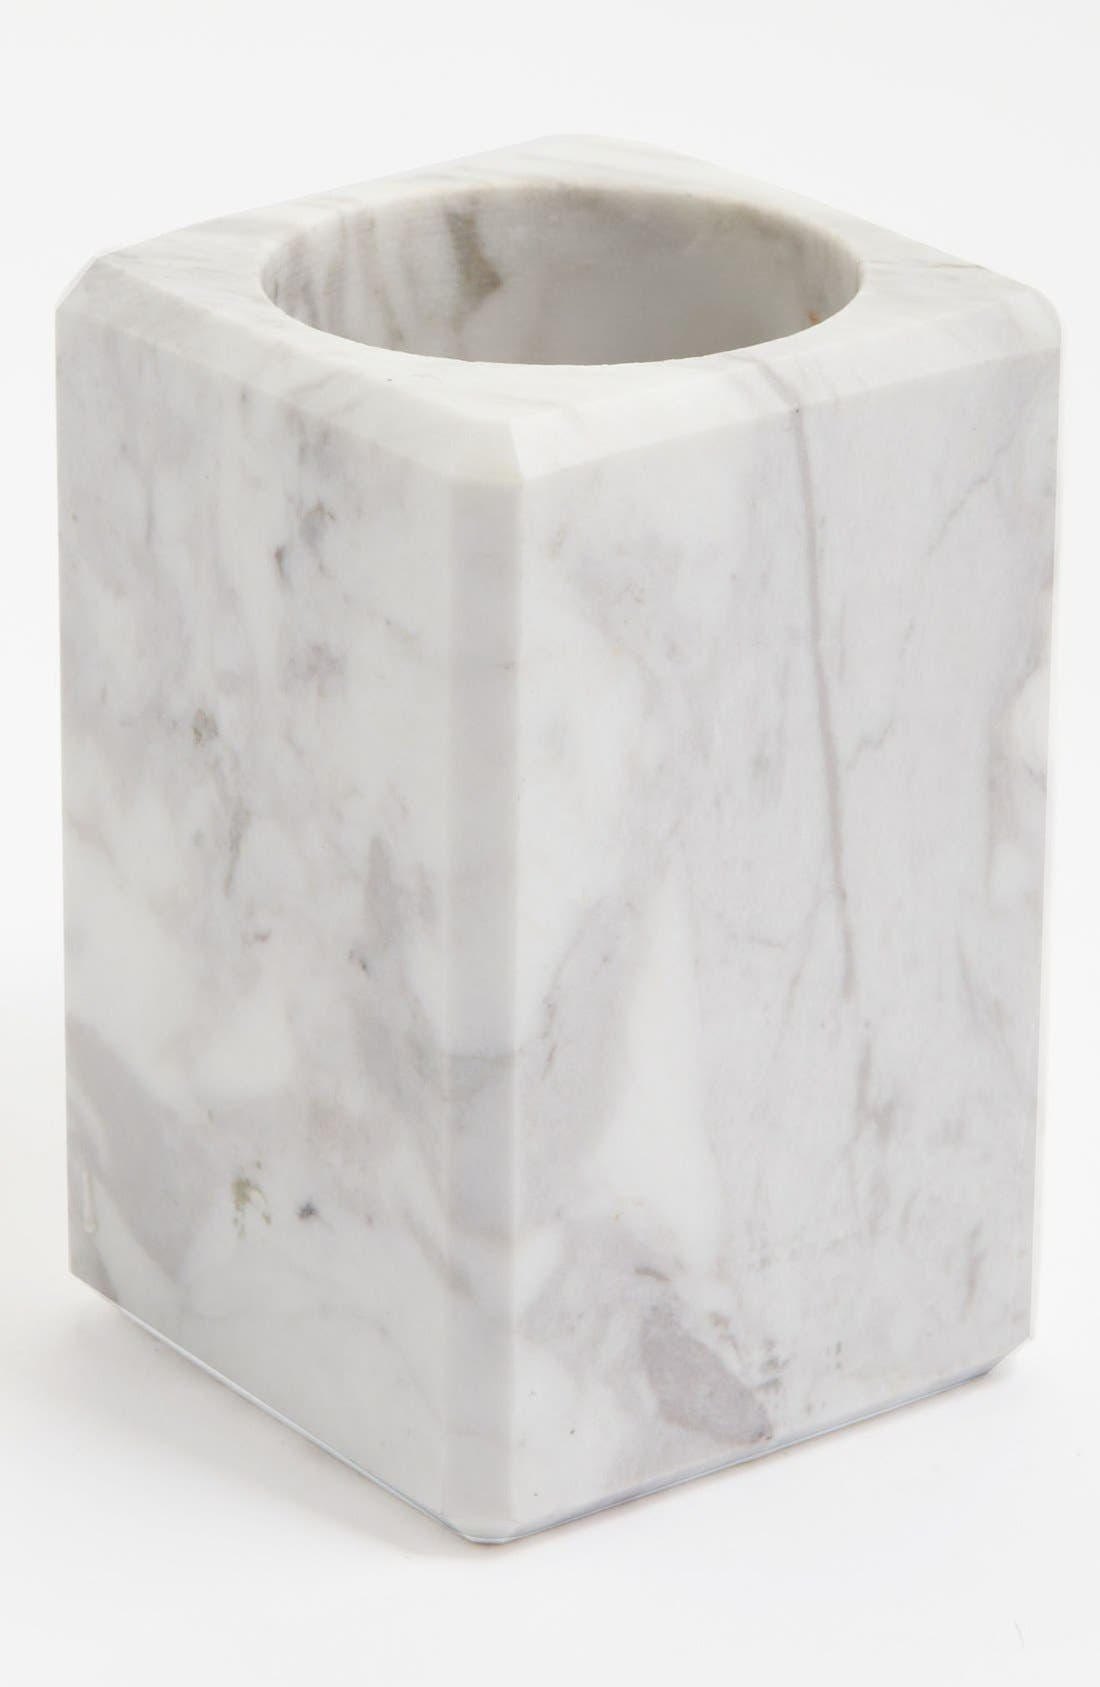 Alternate Image 1 Selected - Waterworks Studio 'Luna' White Marble Tumbler (Online Only)